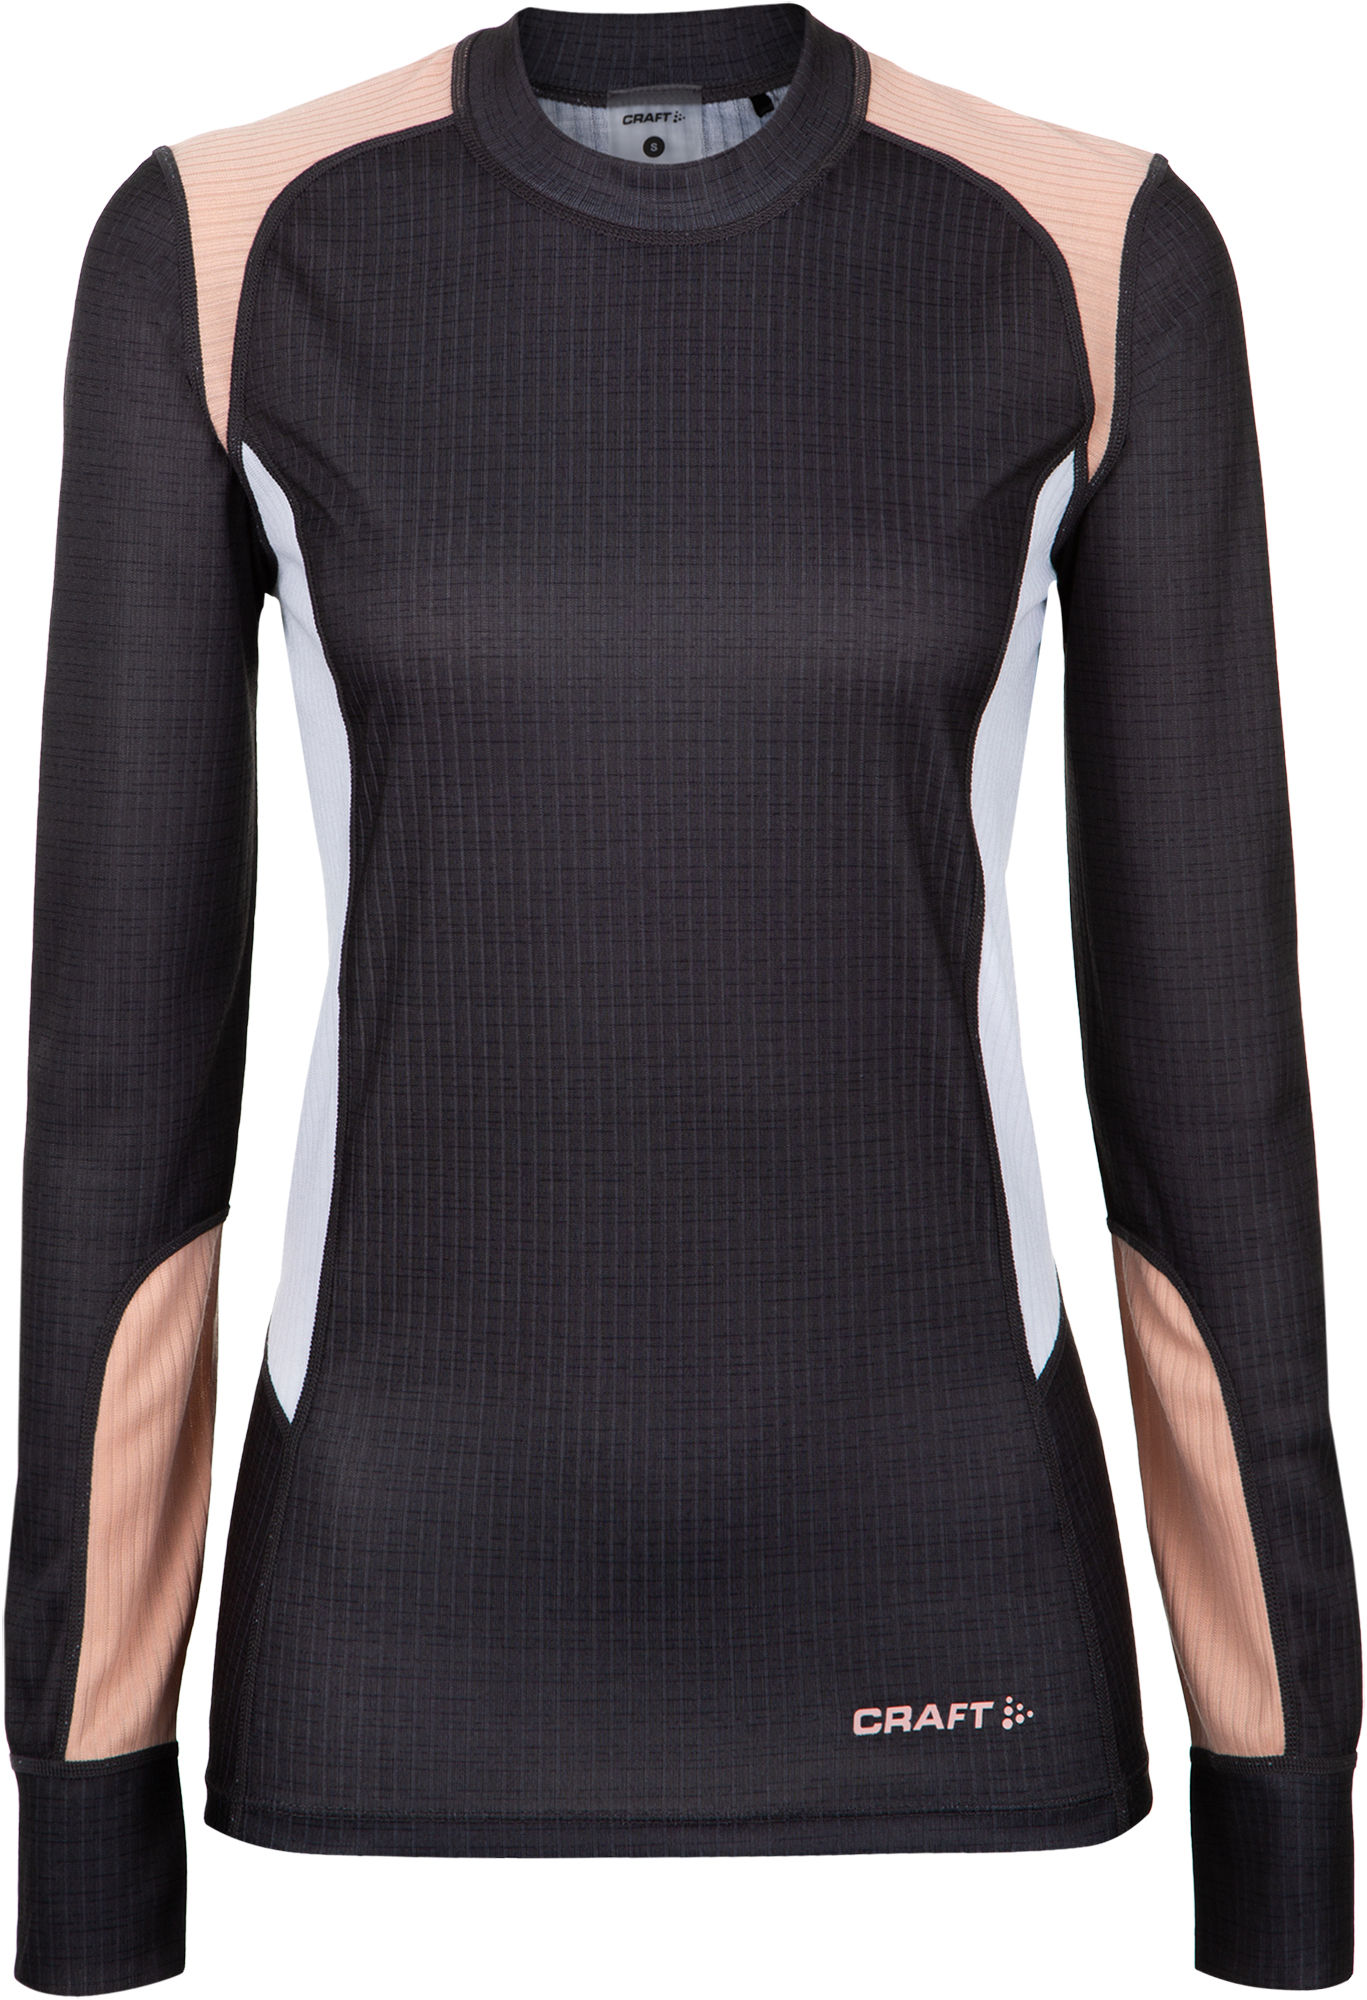 Craft Термофутболка женская Craft, размер 46-48 блузка женская вишня артикул 02 731 цвет молоко размер 46